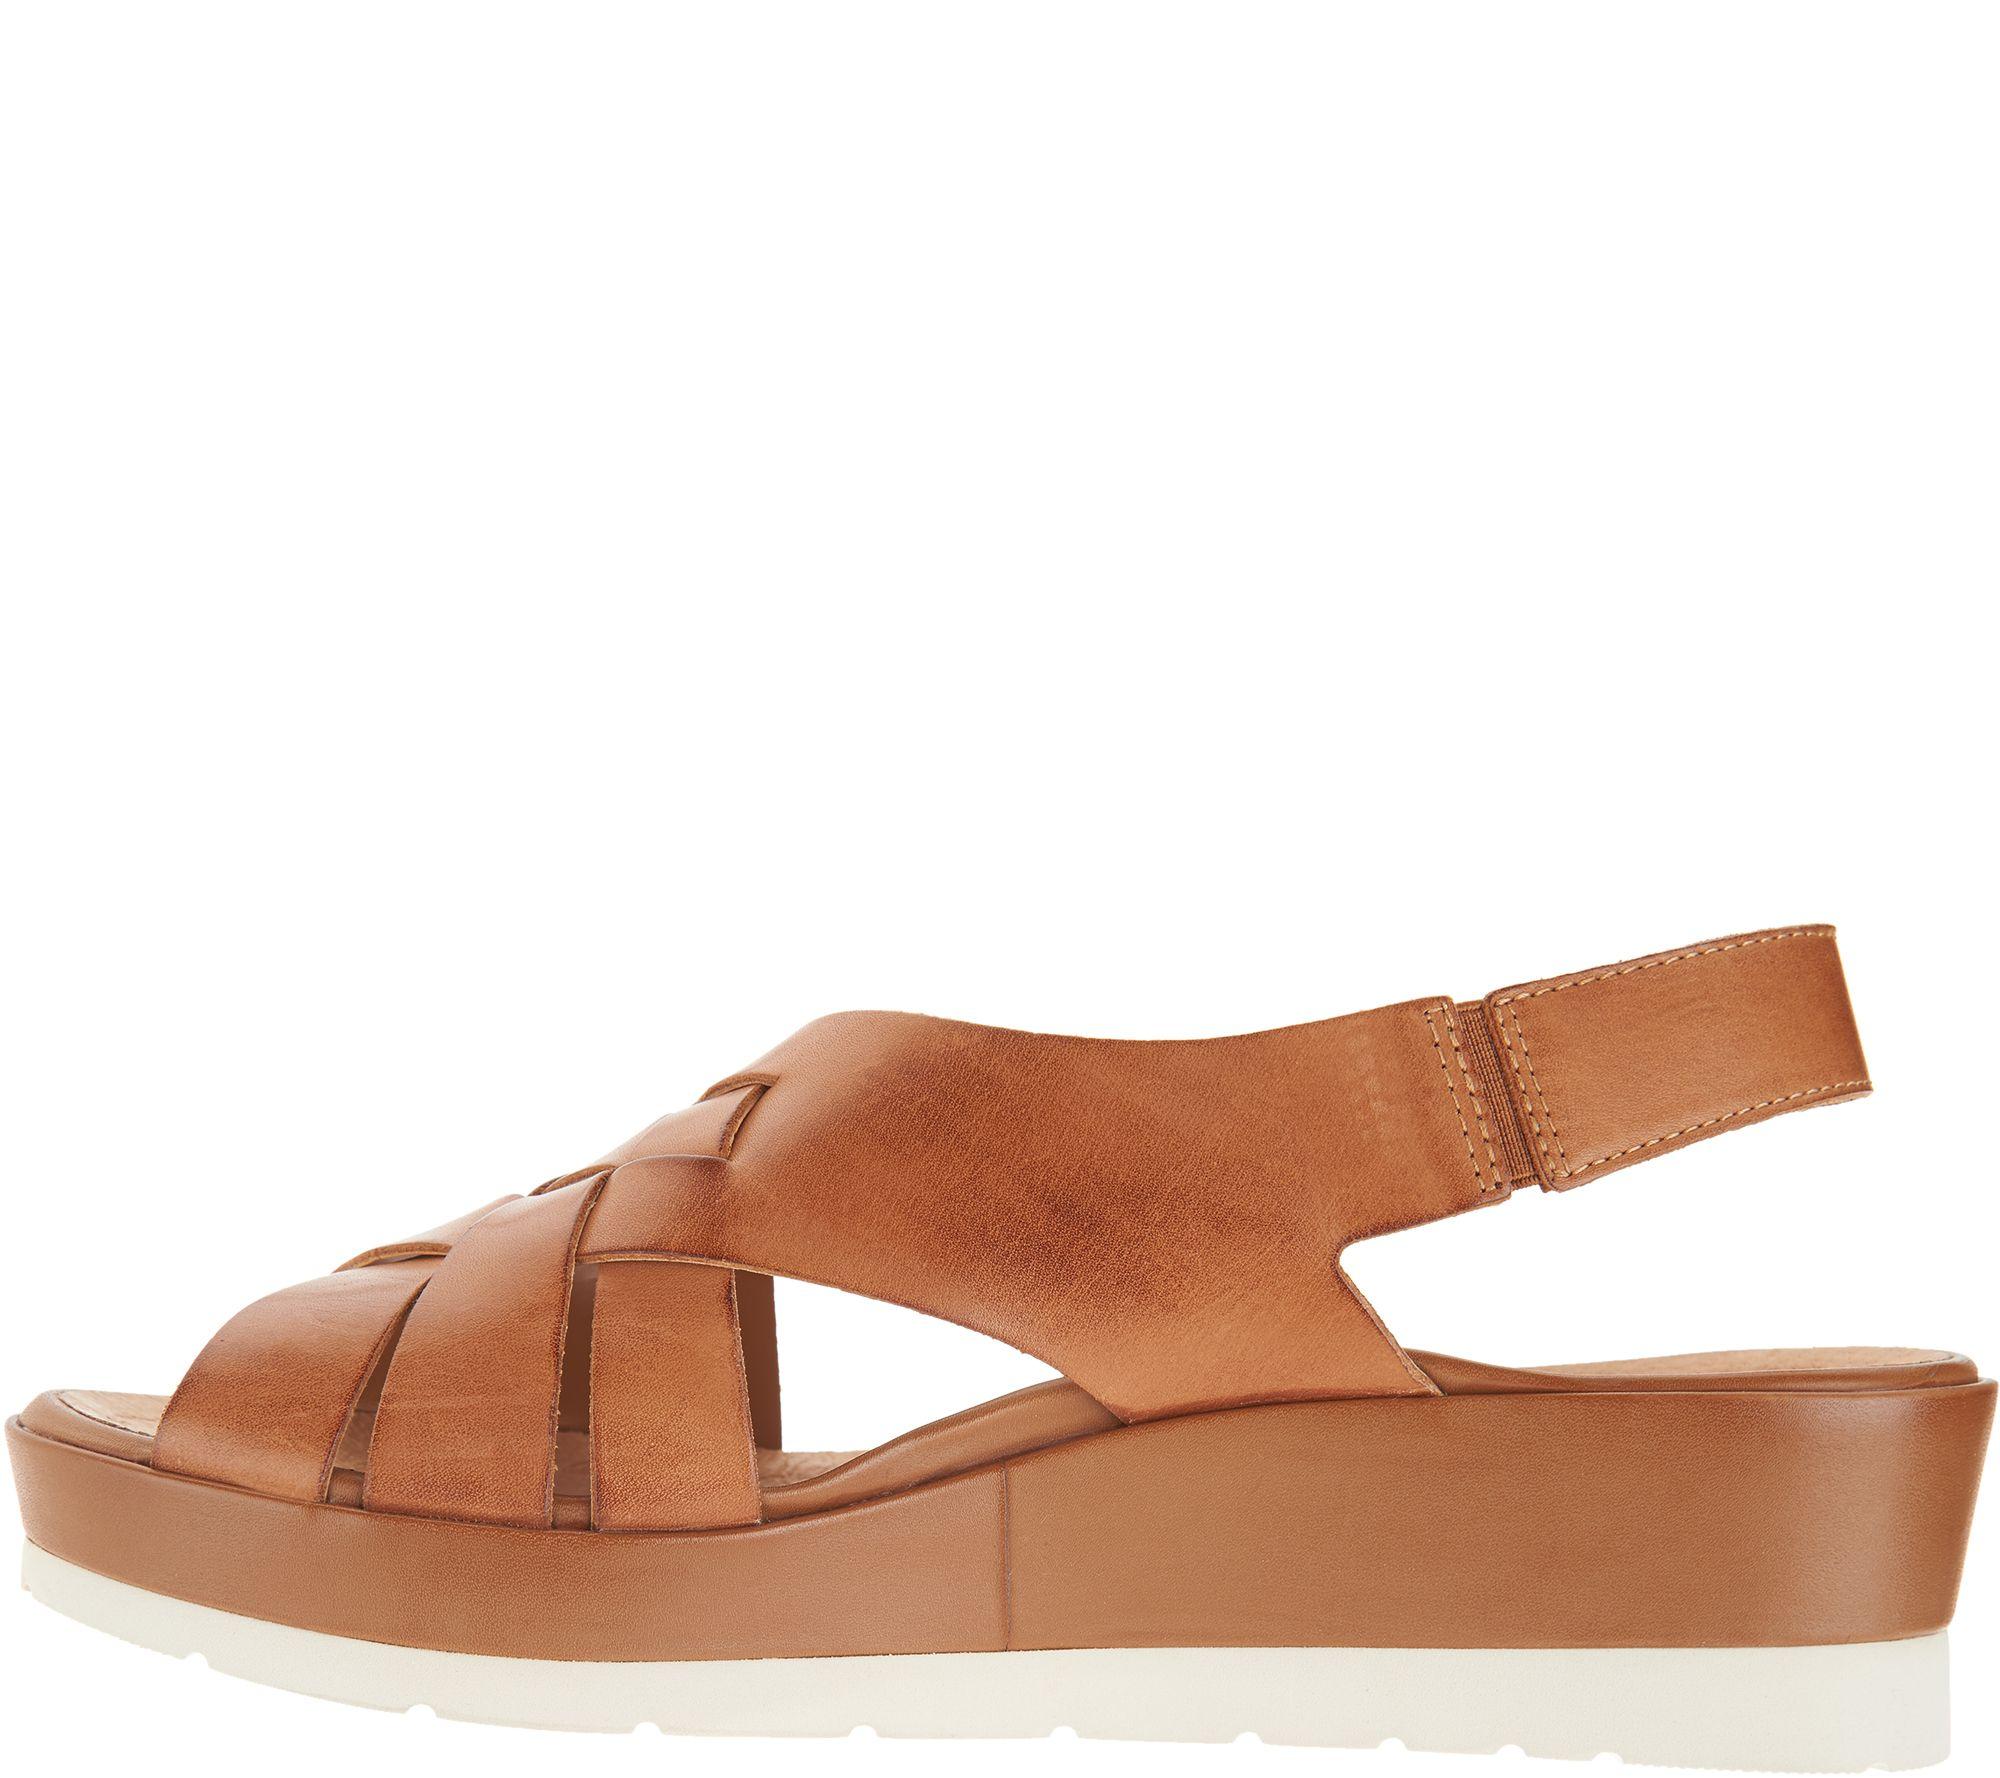 Limited Edition Bandolino Grayson Womens General Open Footwear Orange/Tan HP